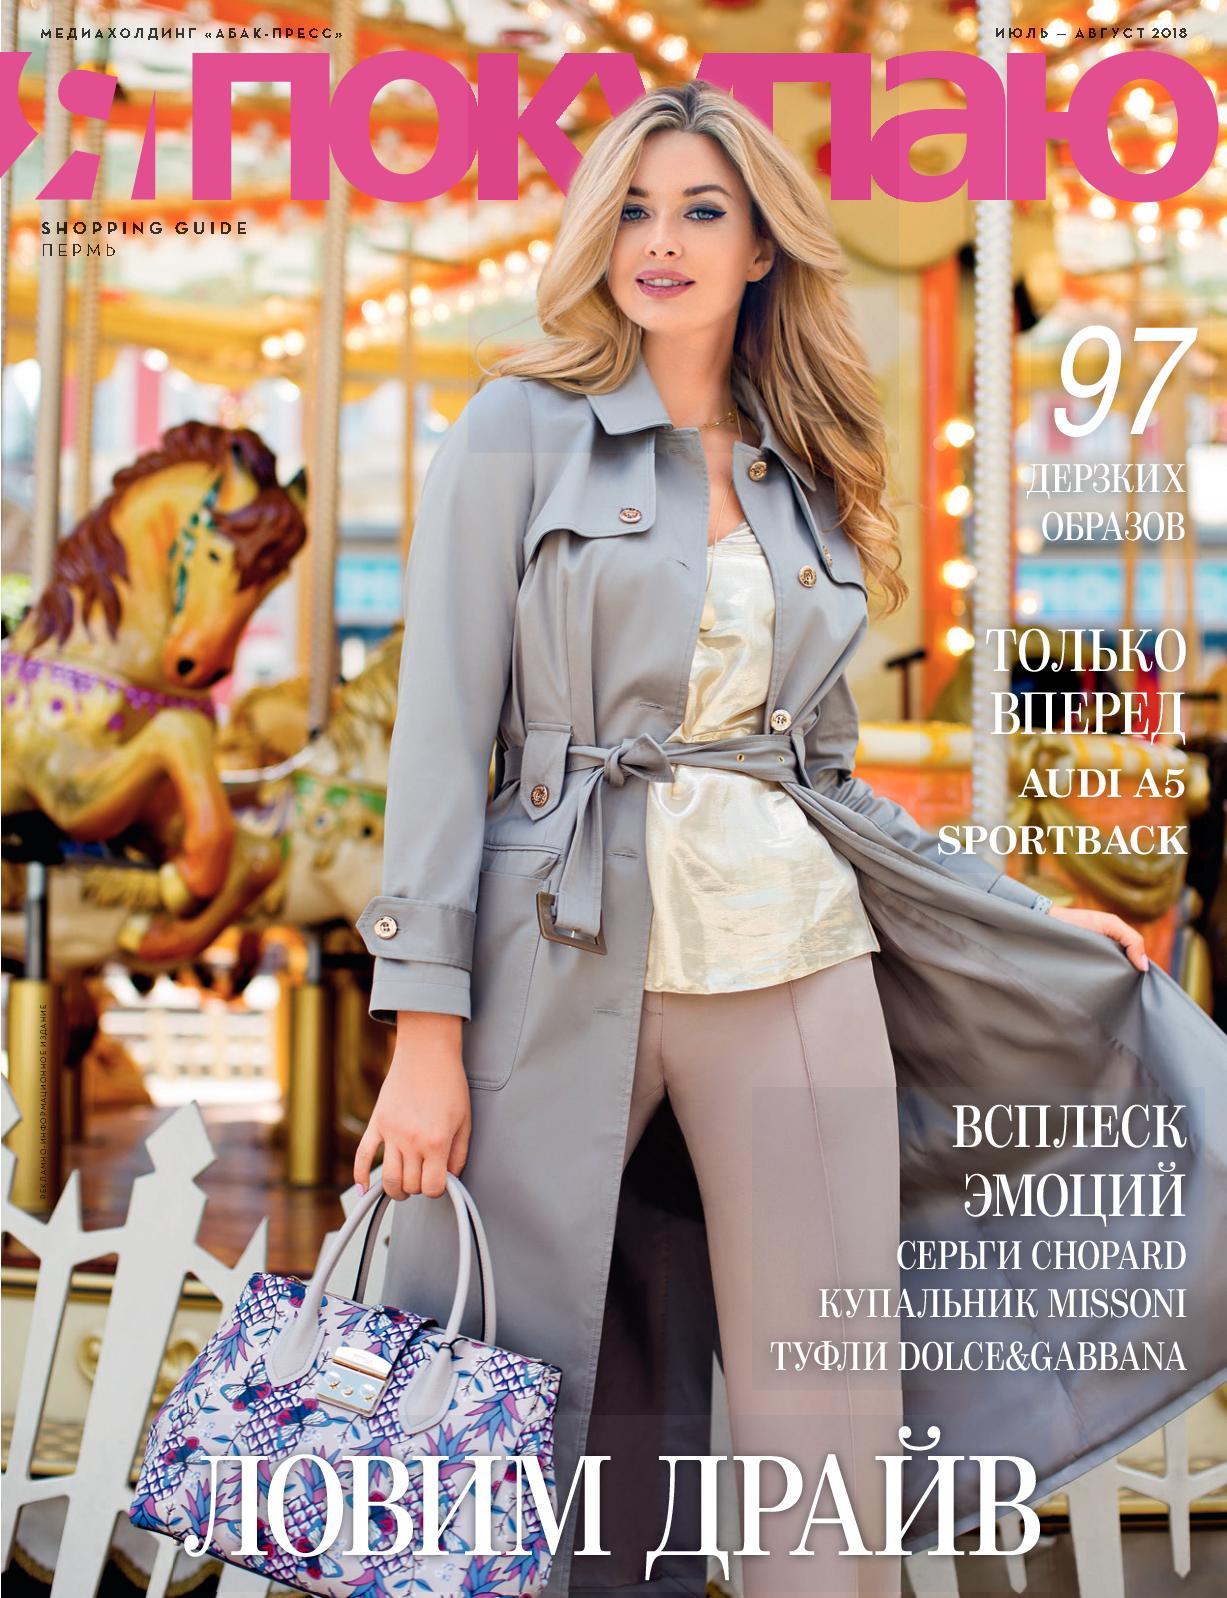 db528966a7af Calaméo - Shopping Guide «Я Покупаю. Пермь», июль-август 2018